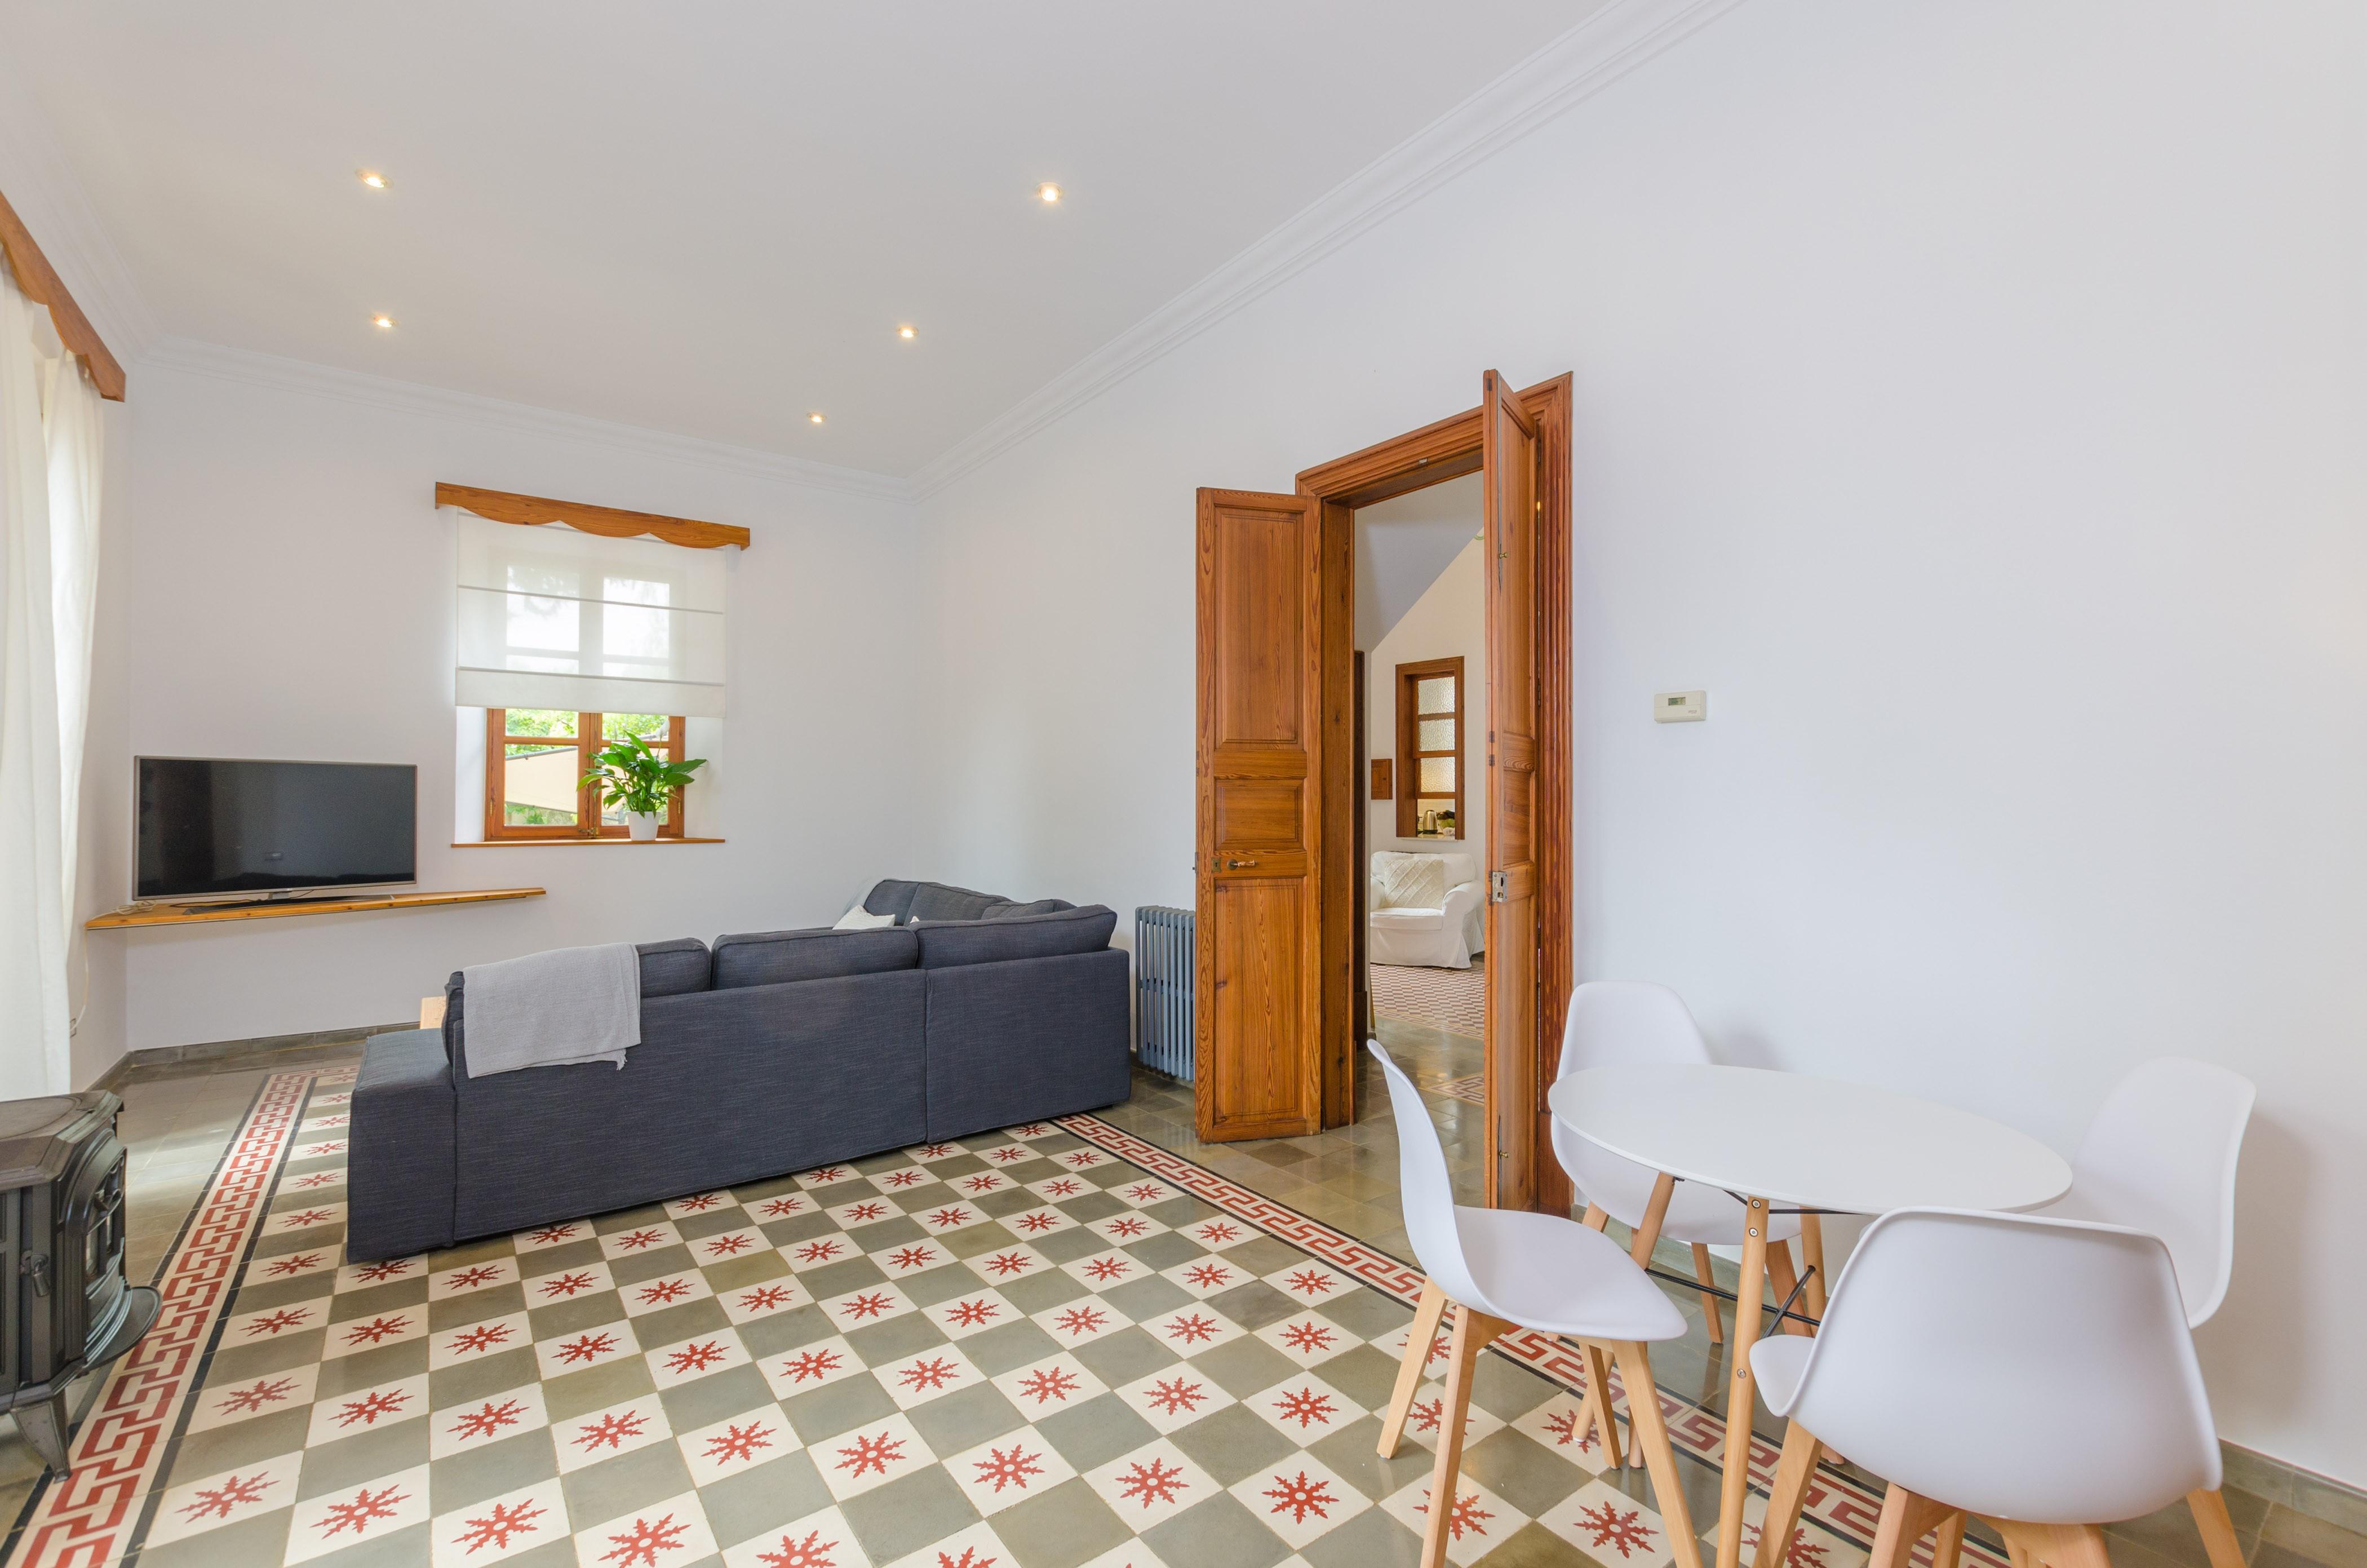 Maison de vacances CAS CONVIDATS (2435013), Alaro, Majorque, Iles Baléares, Espagne, image 17